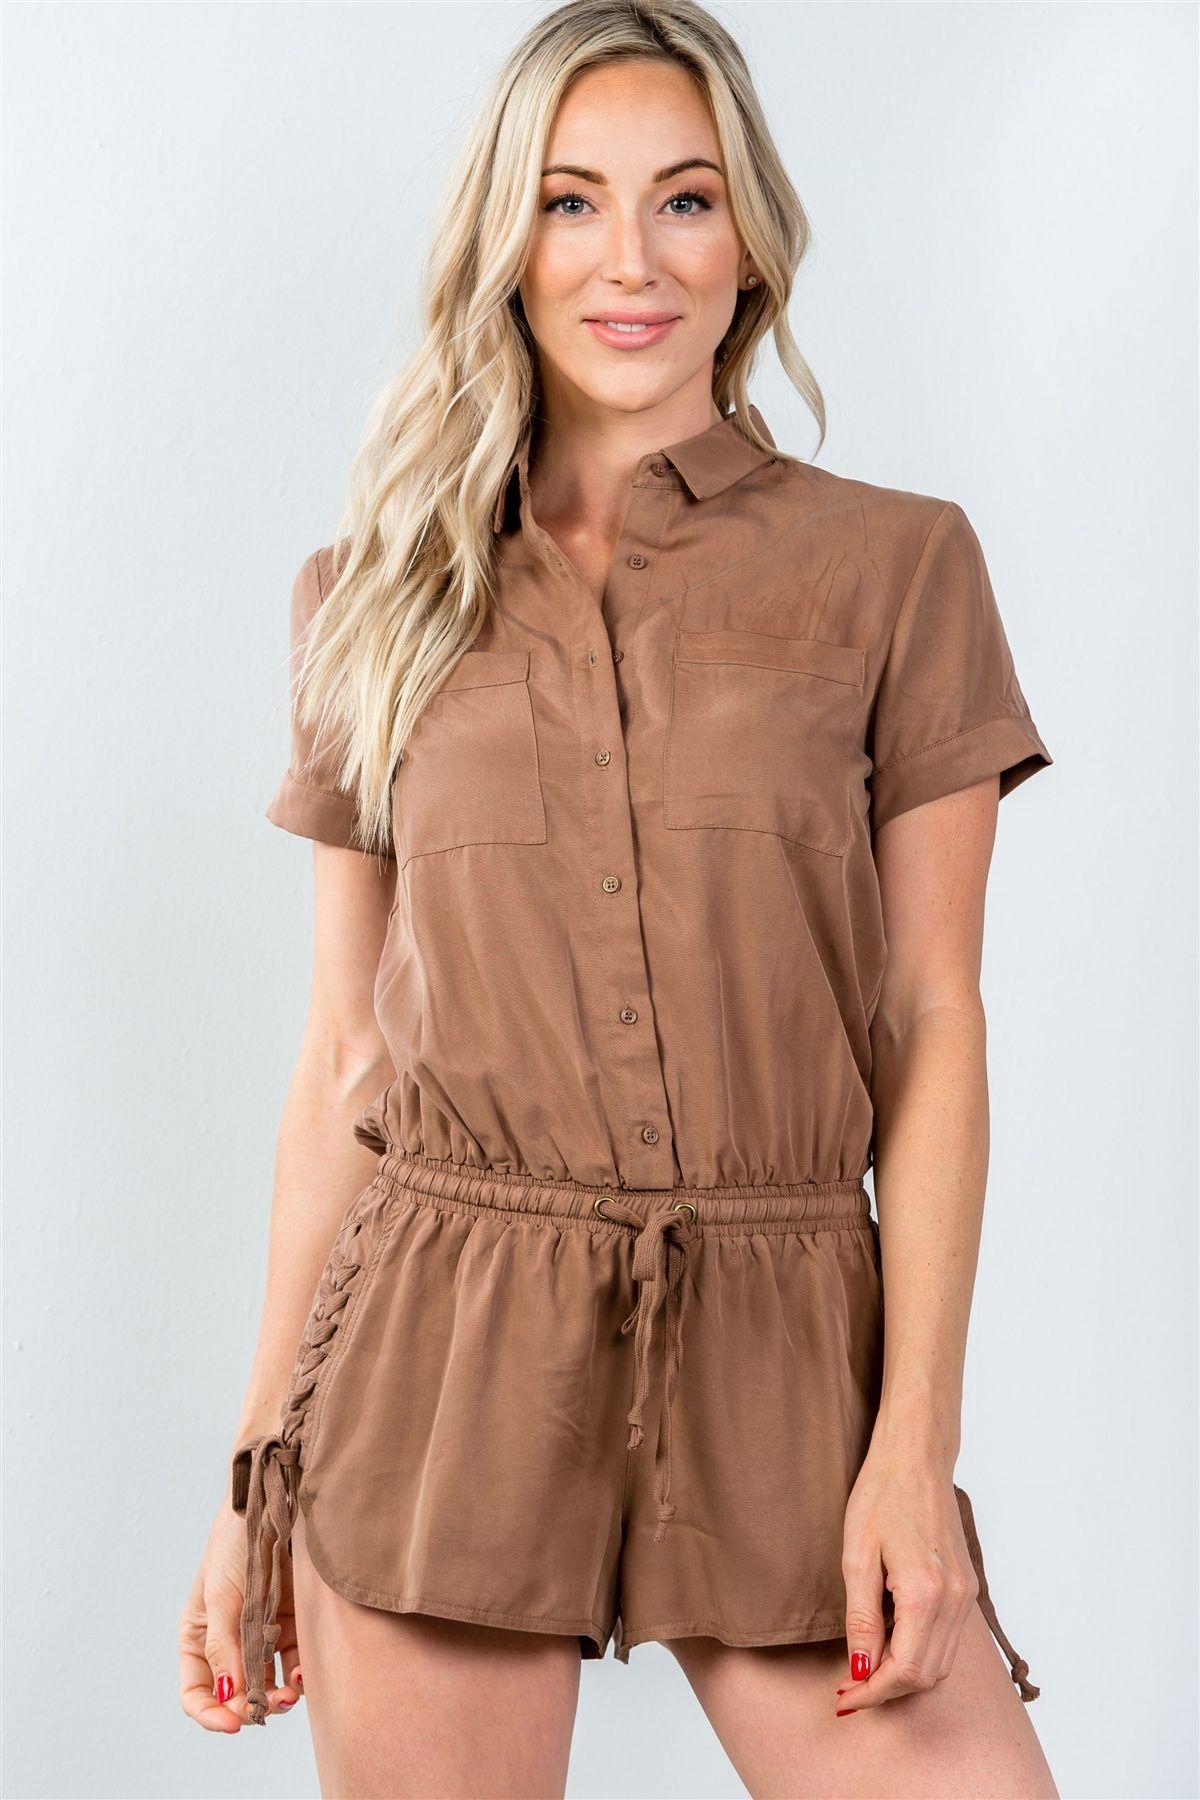 Ladies fashion button down closure laceup side drawstring romper